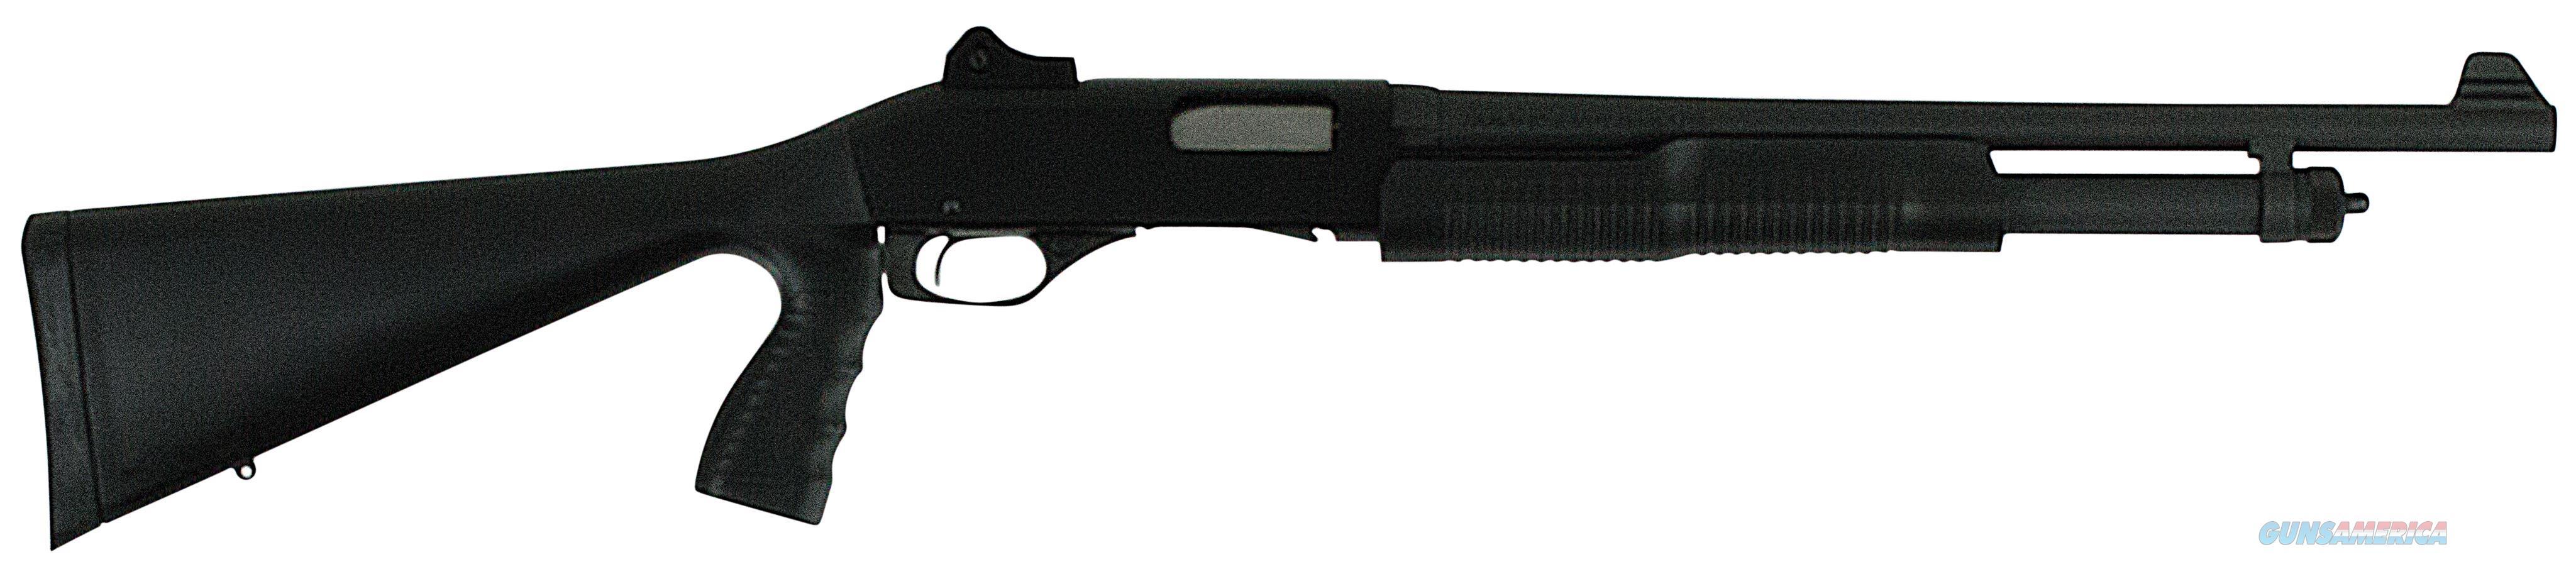 "Stevens 22439 320 Security Pump 20Ga 18.5"" 3"" Grs Blk Syn W/Pistol Grip 22439  Guns > Shotguns > S Misc Shotguns"